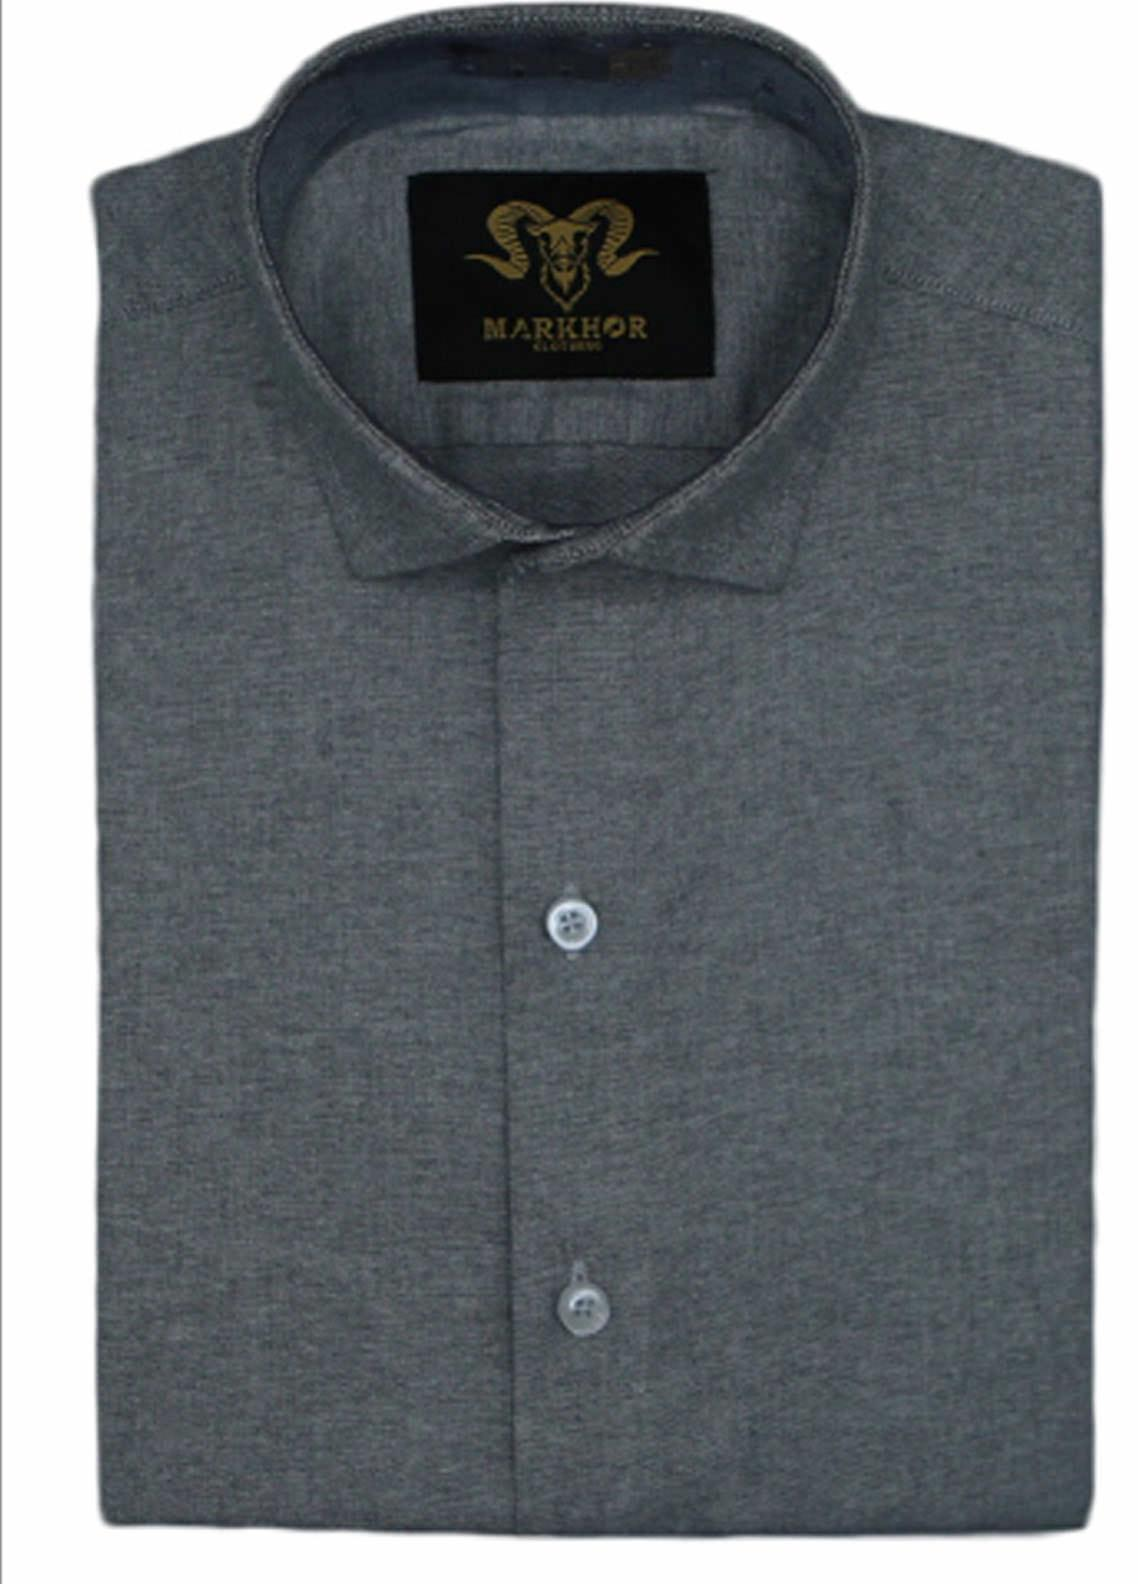 Markhor Clothing Chambray Cotton Formal Shirts for Men - Charcoal Grey Chambray Cotton Slim Fit Formal Shirt